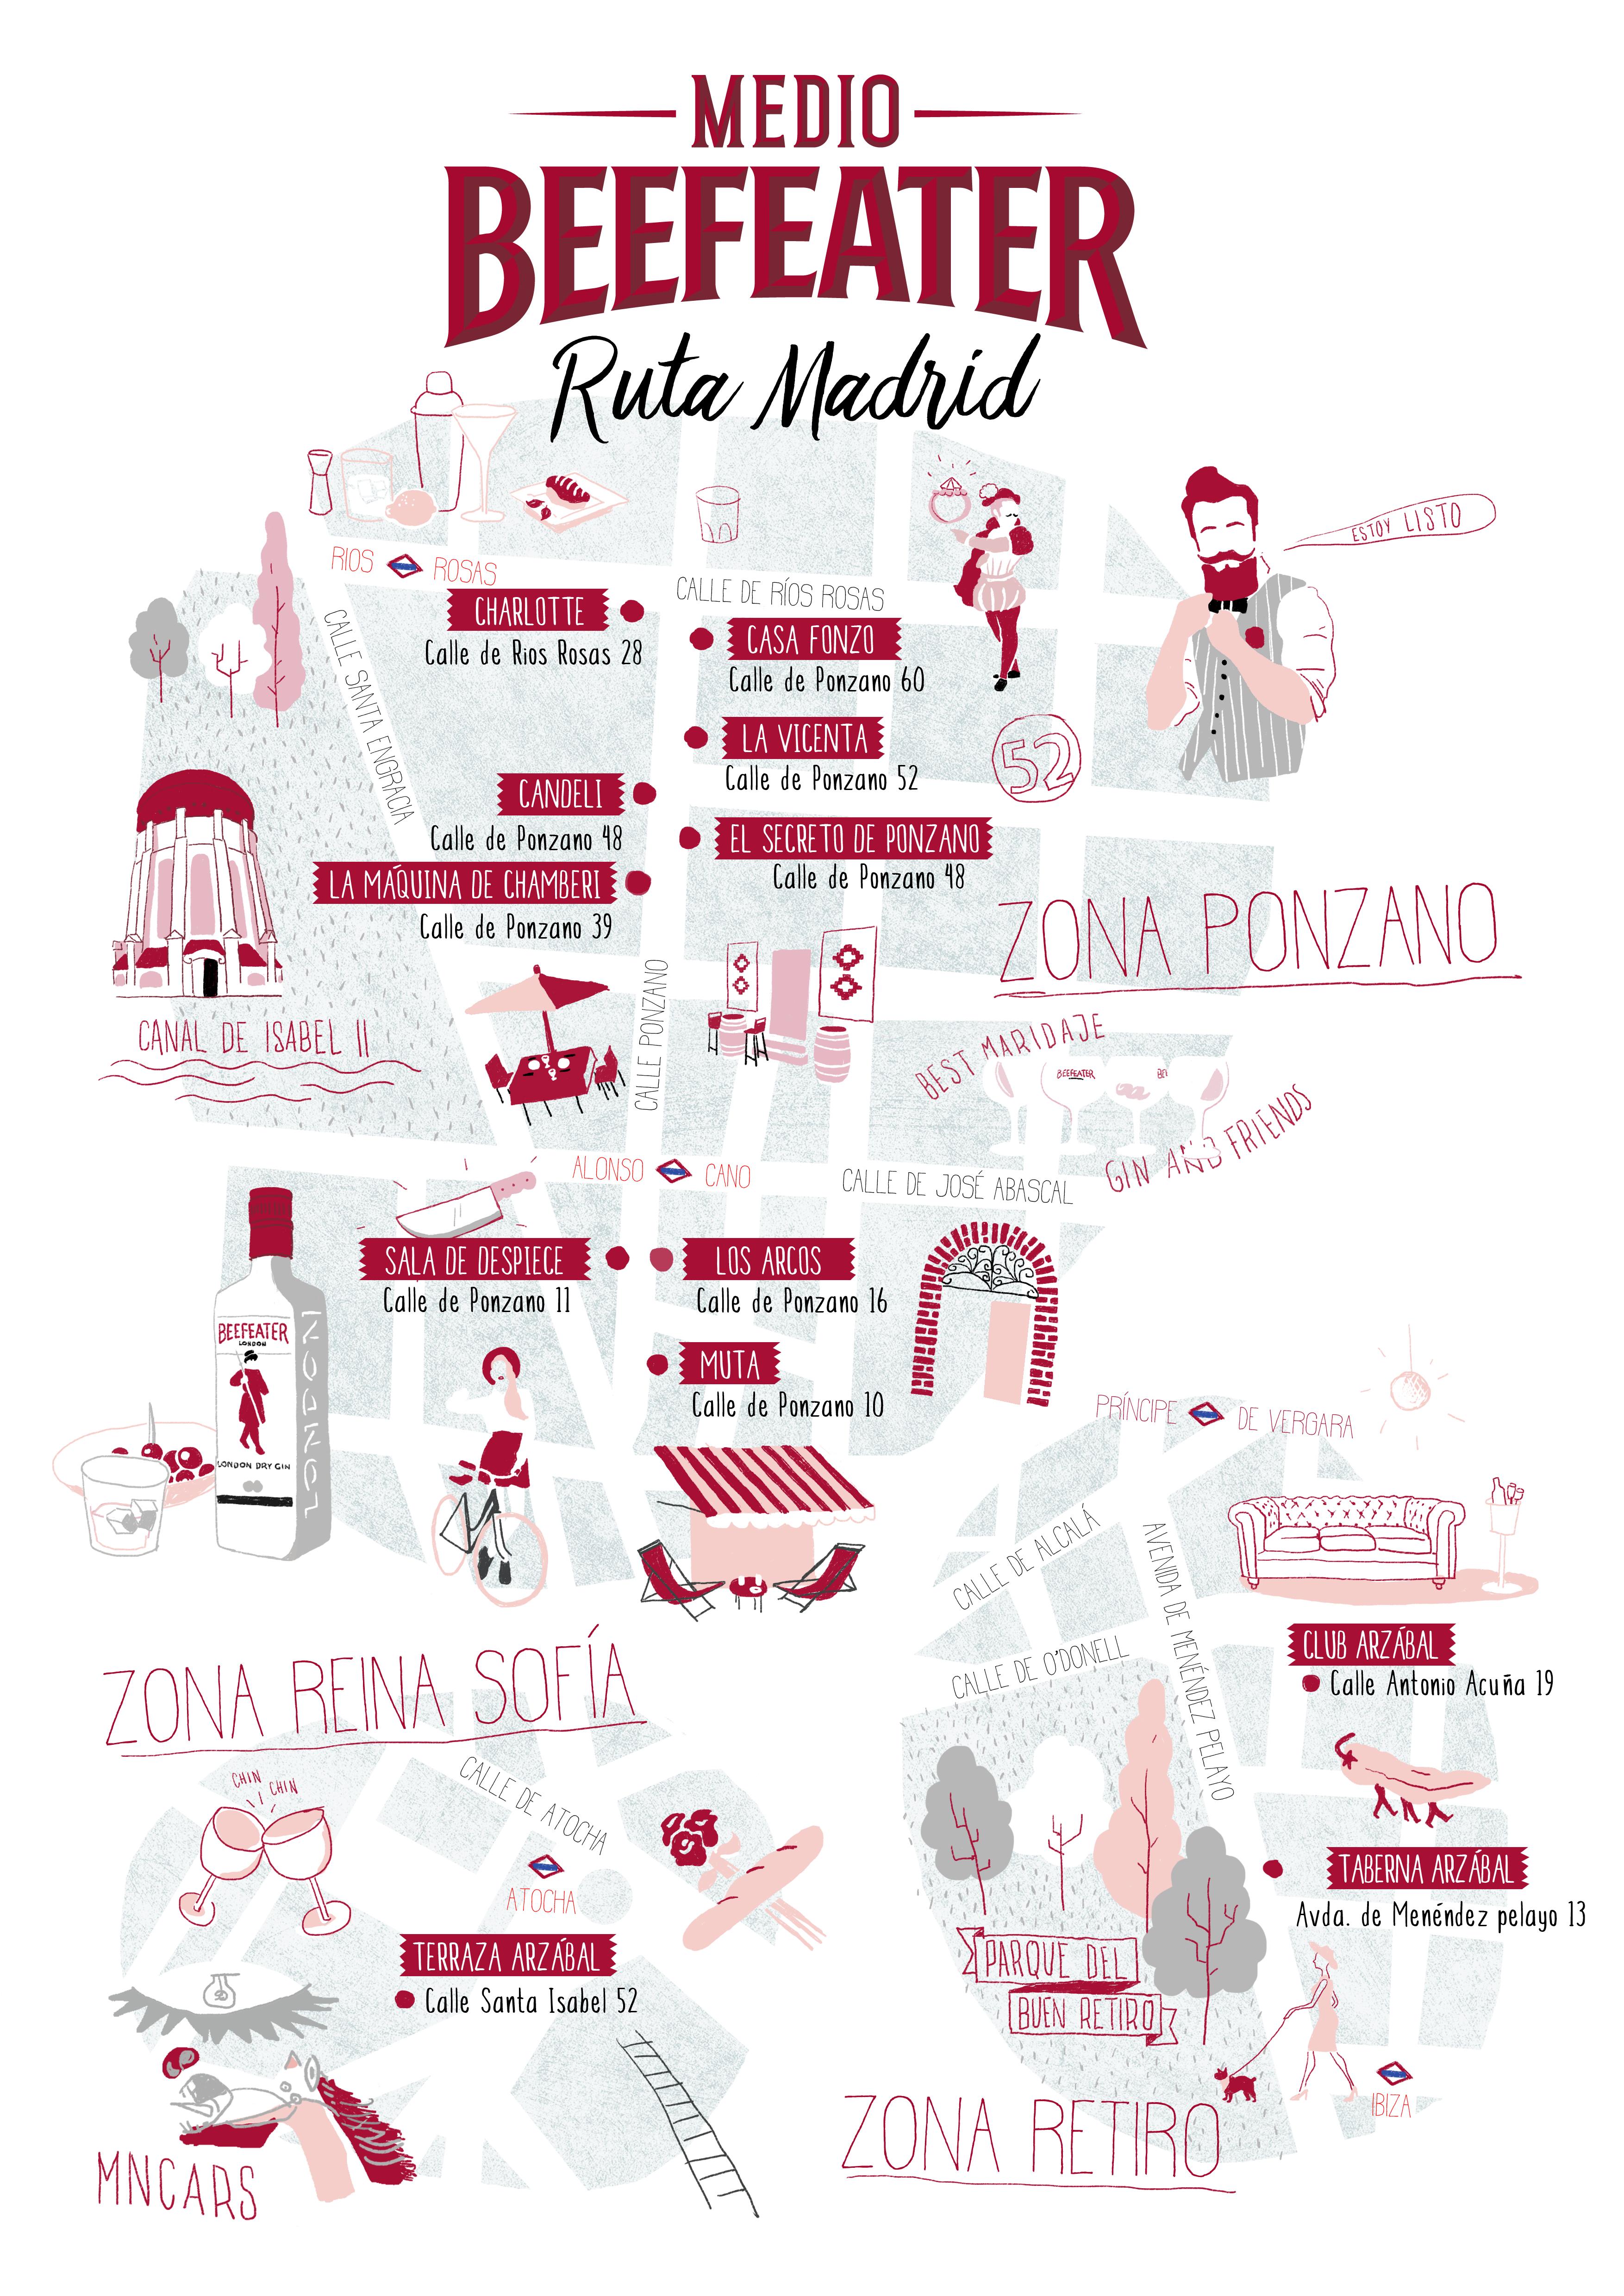 MAPA MEDIOS BEEFEATER MADRID 2